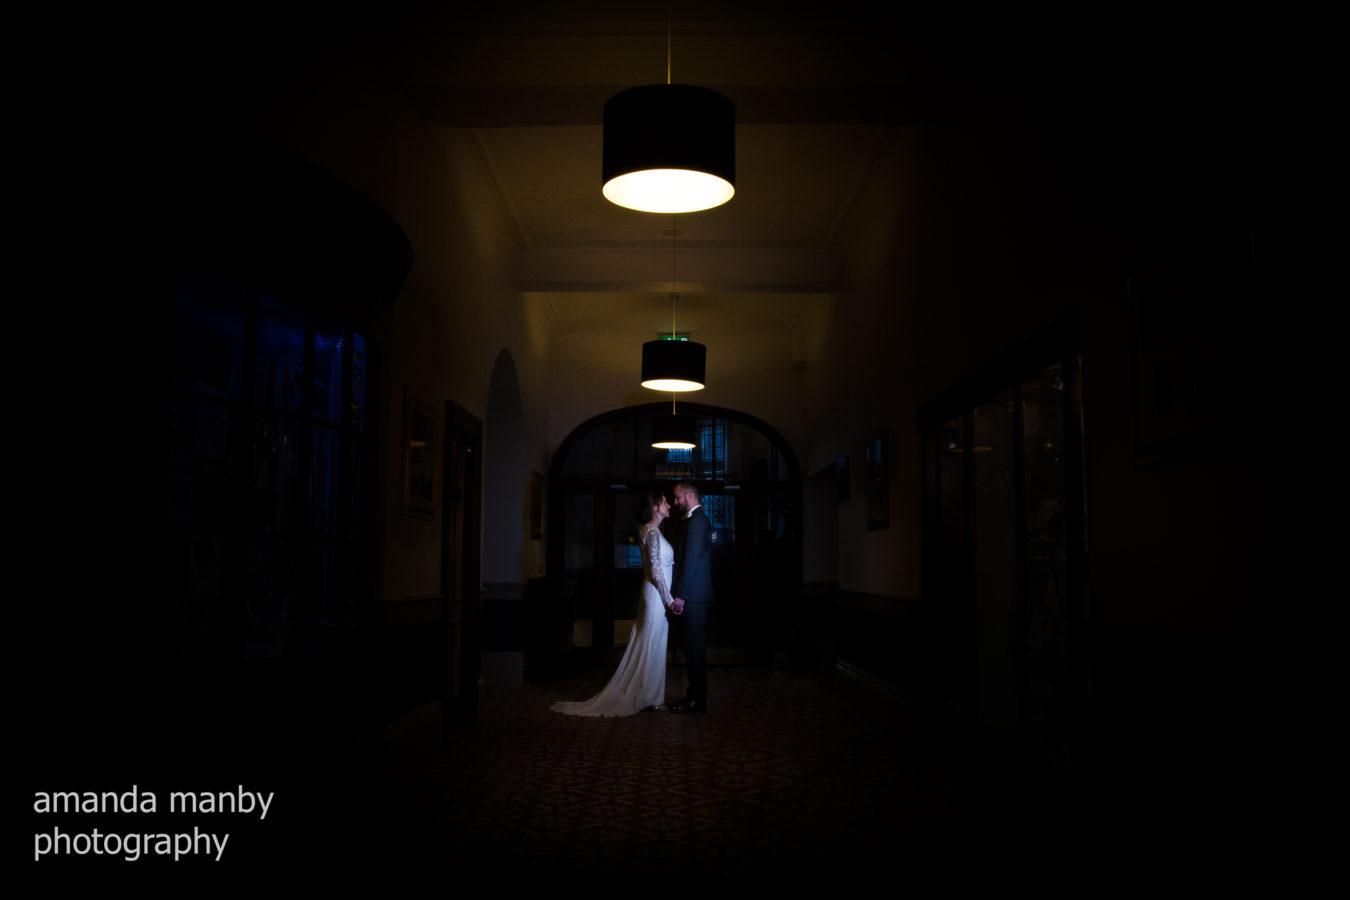 Creative wedding photography harrogate